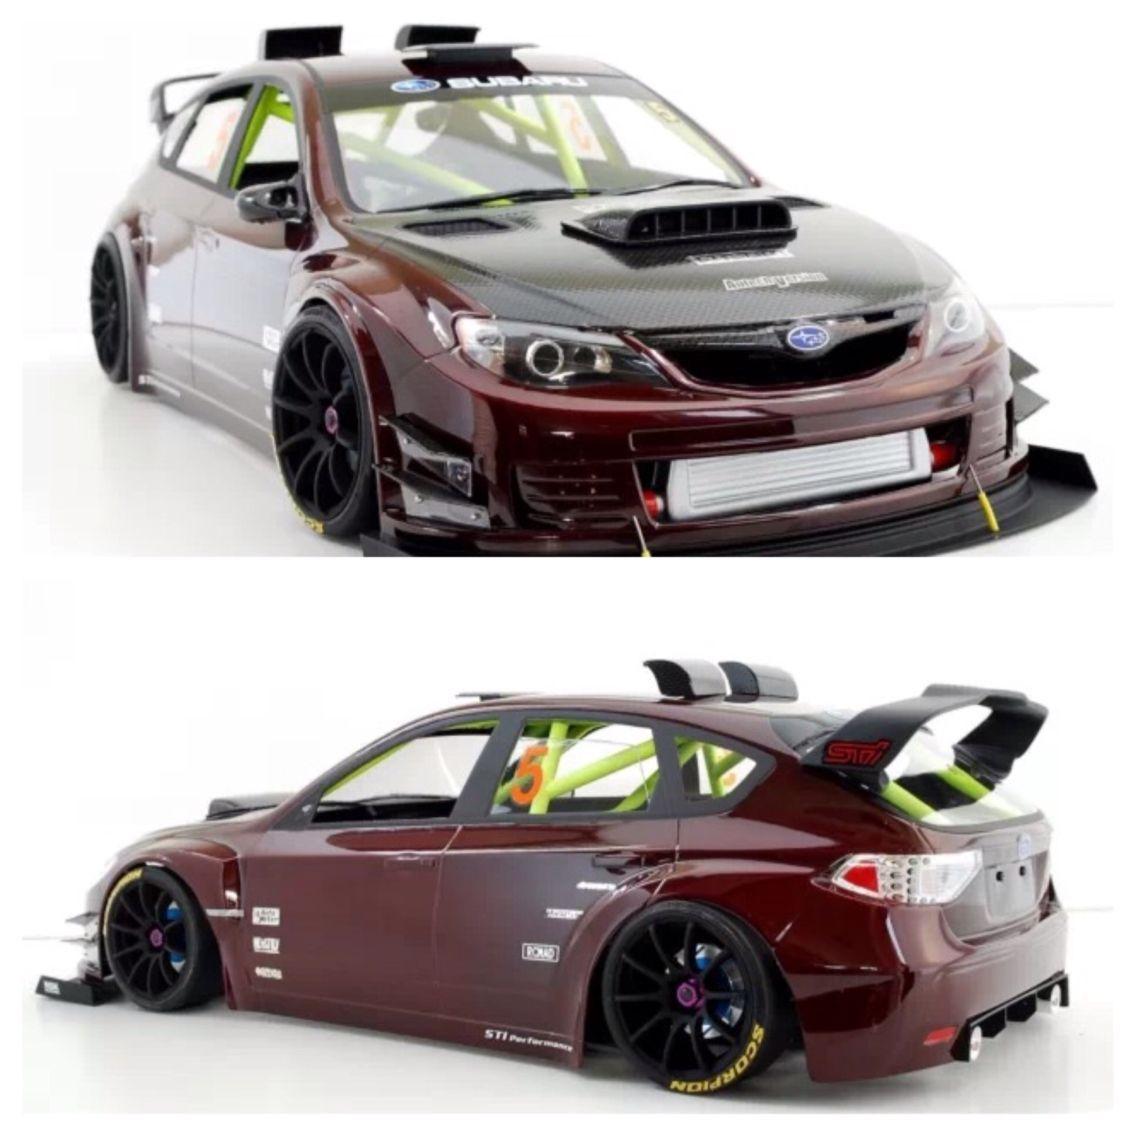 Subaru Impreza Sti Rc Drift Car Rc Drift Subaru Impreza Sti